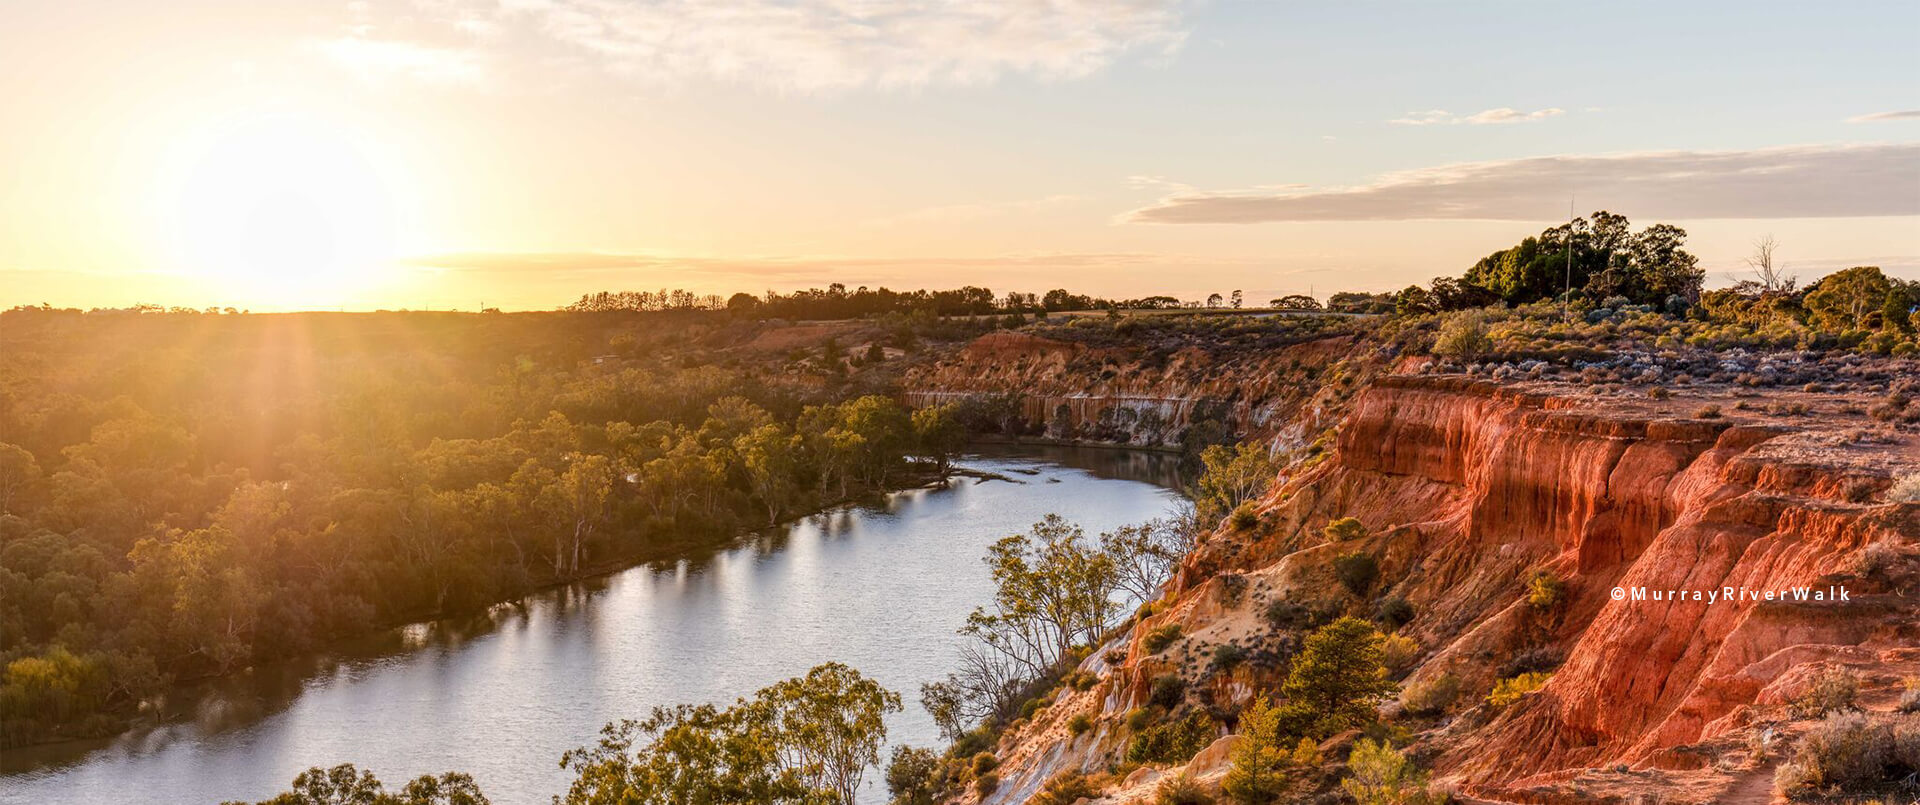 Kangaroo Island/ Murray River